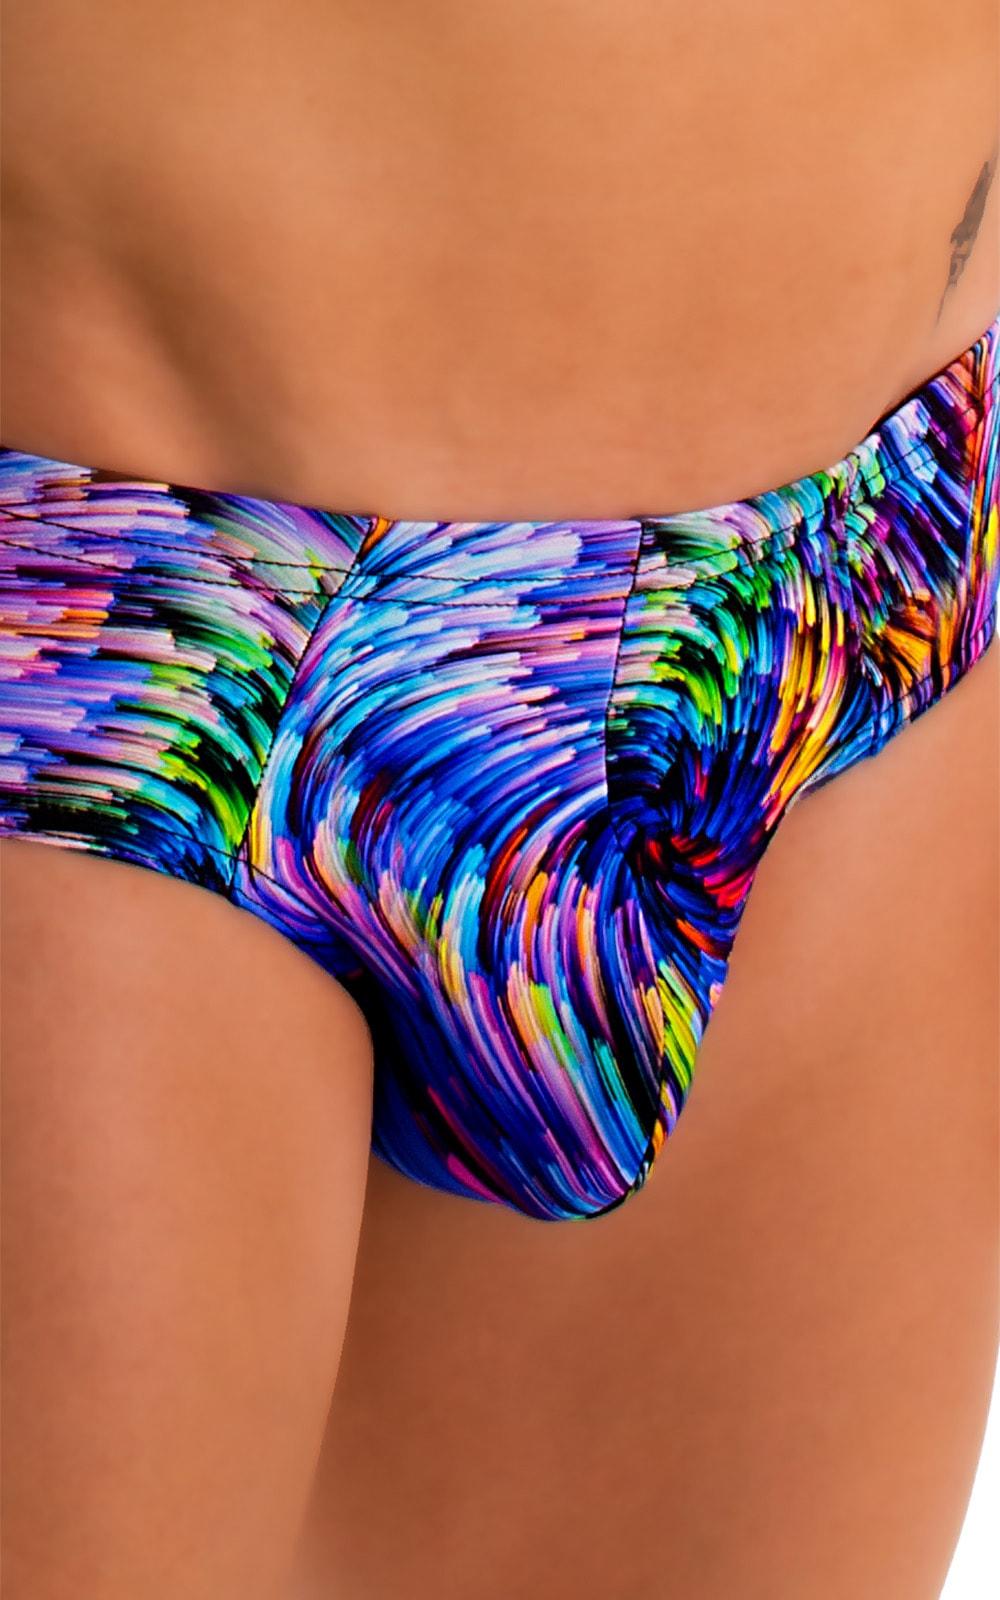 Pouch Brief Swimsuit in Illumine 3